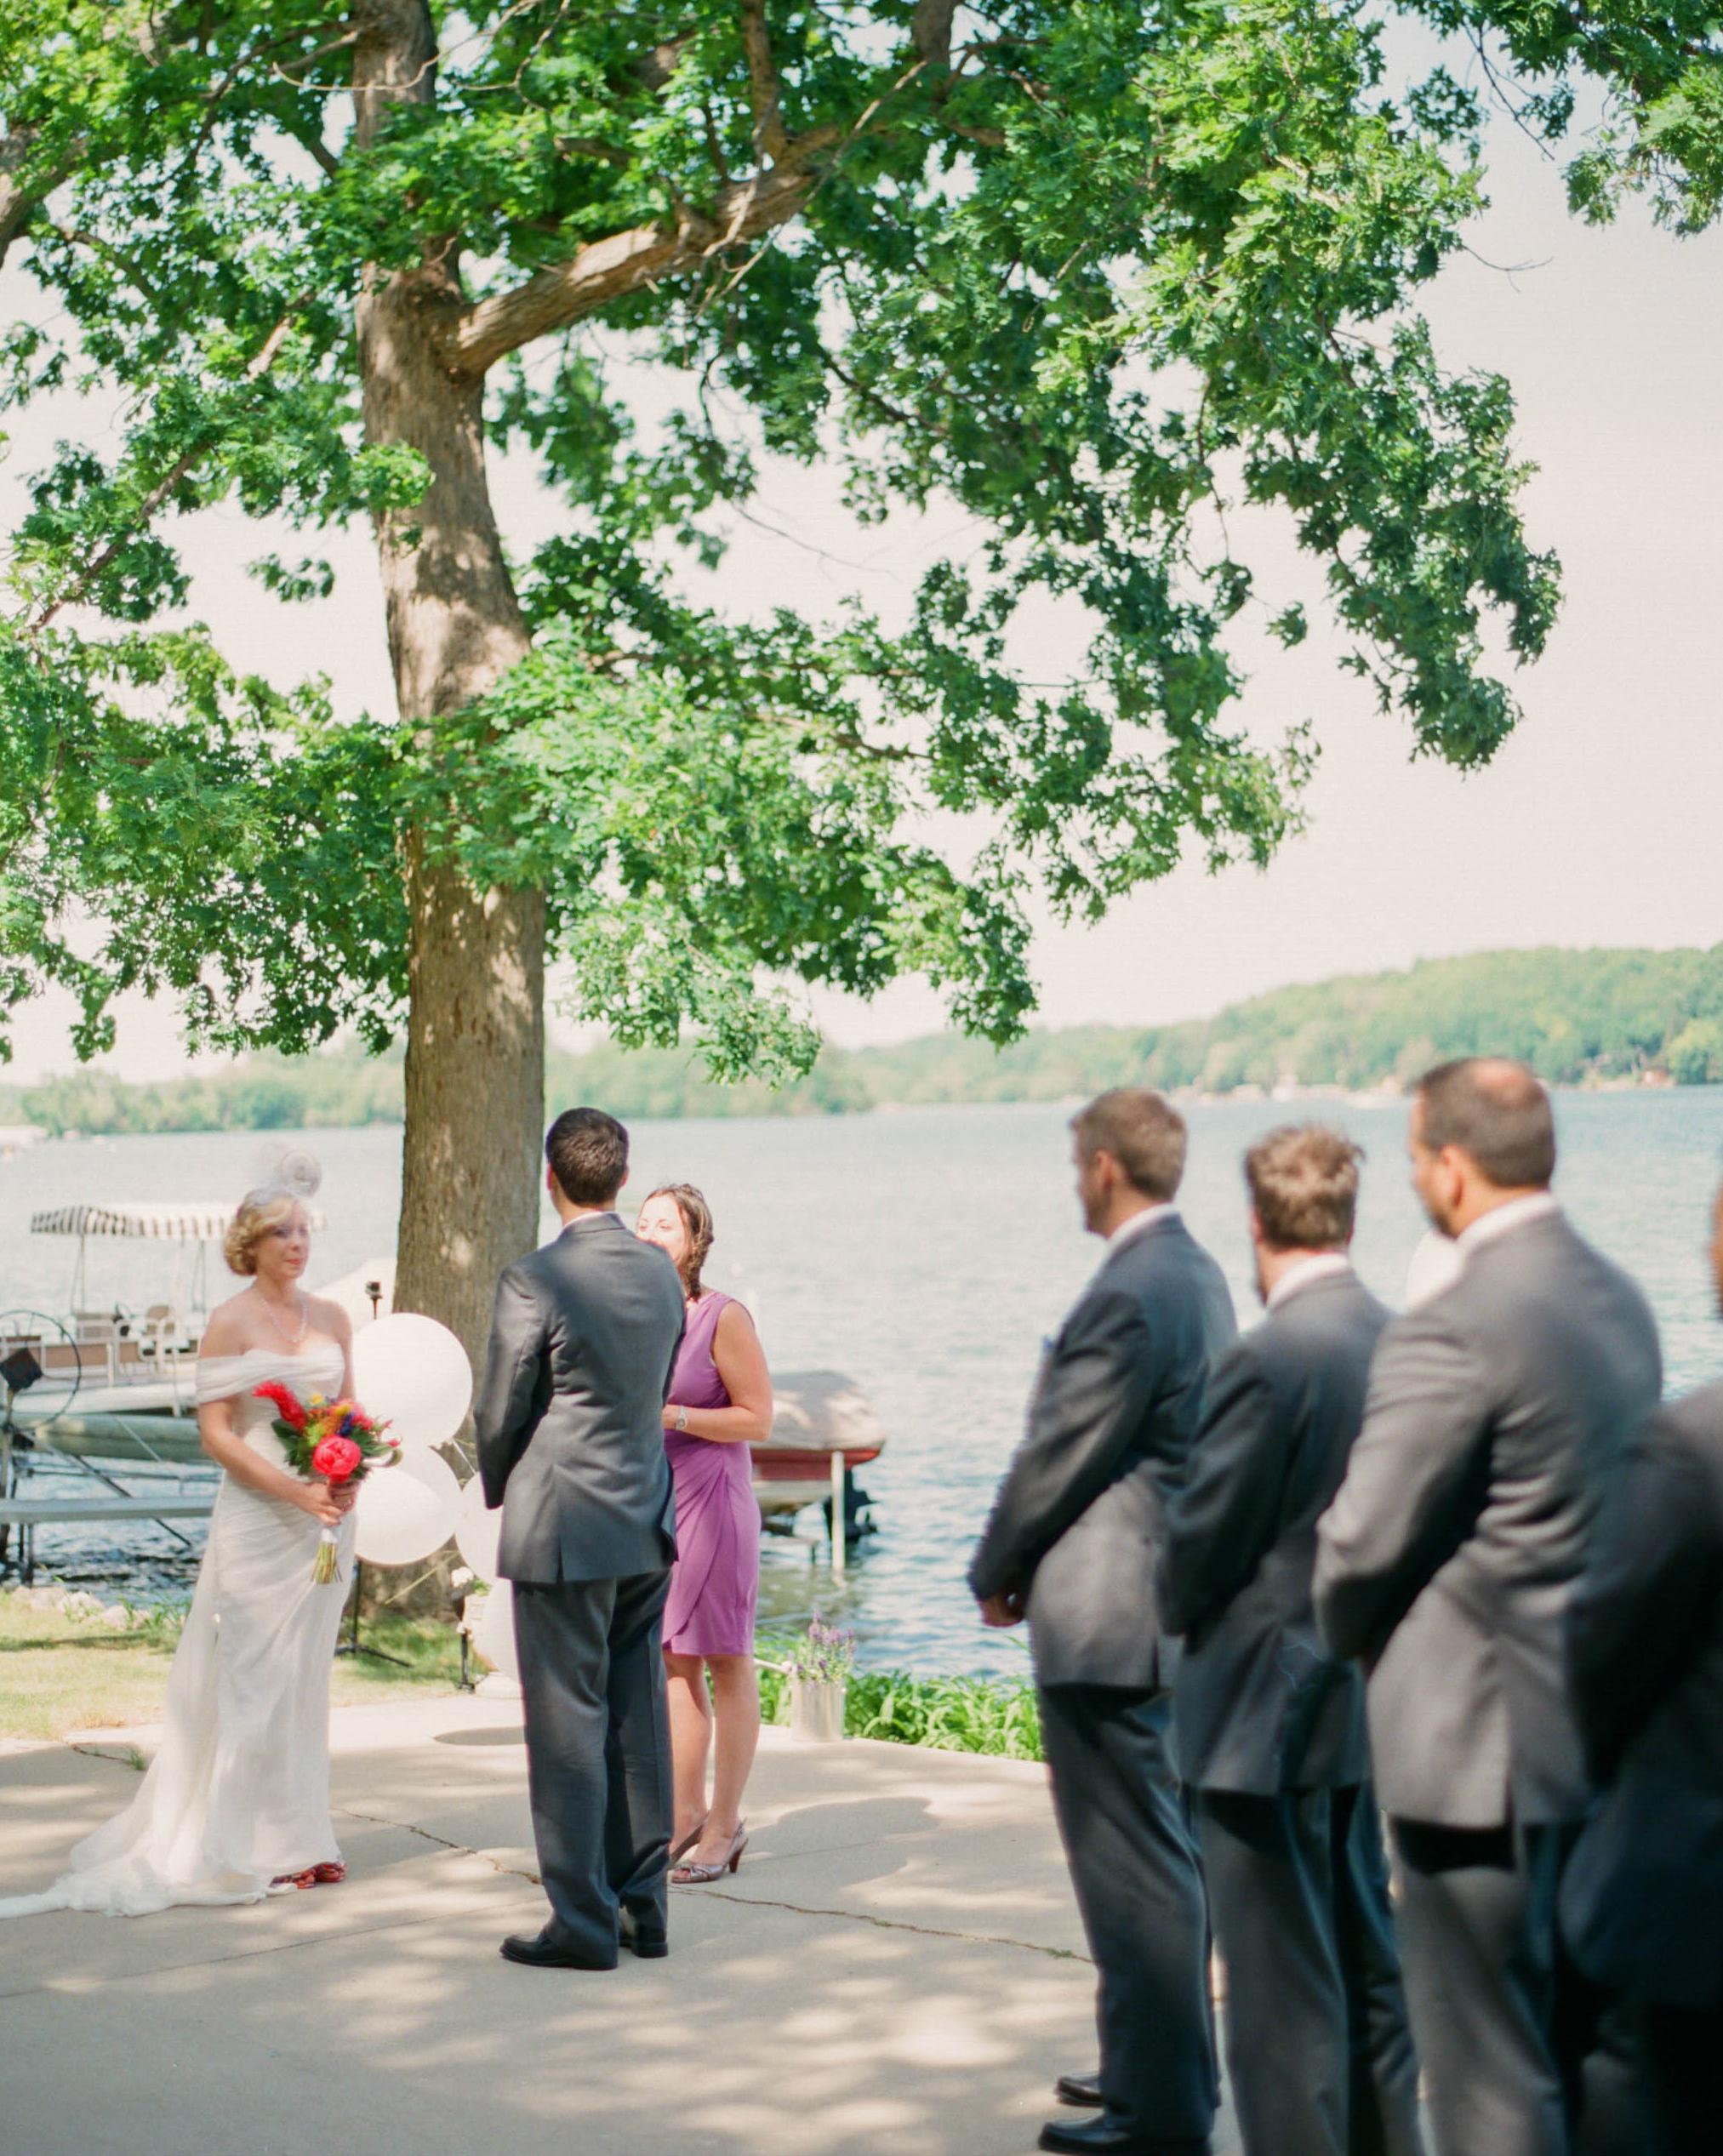 liz-jeff-wedding-ceremony-080-s112303-1115.jpg